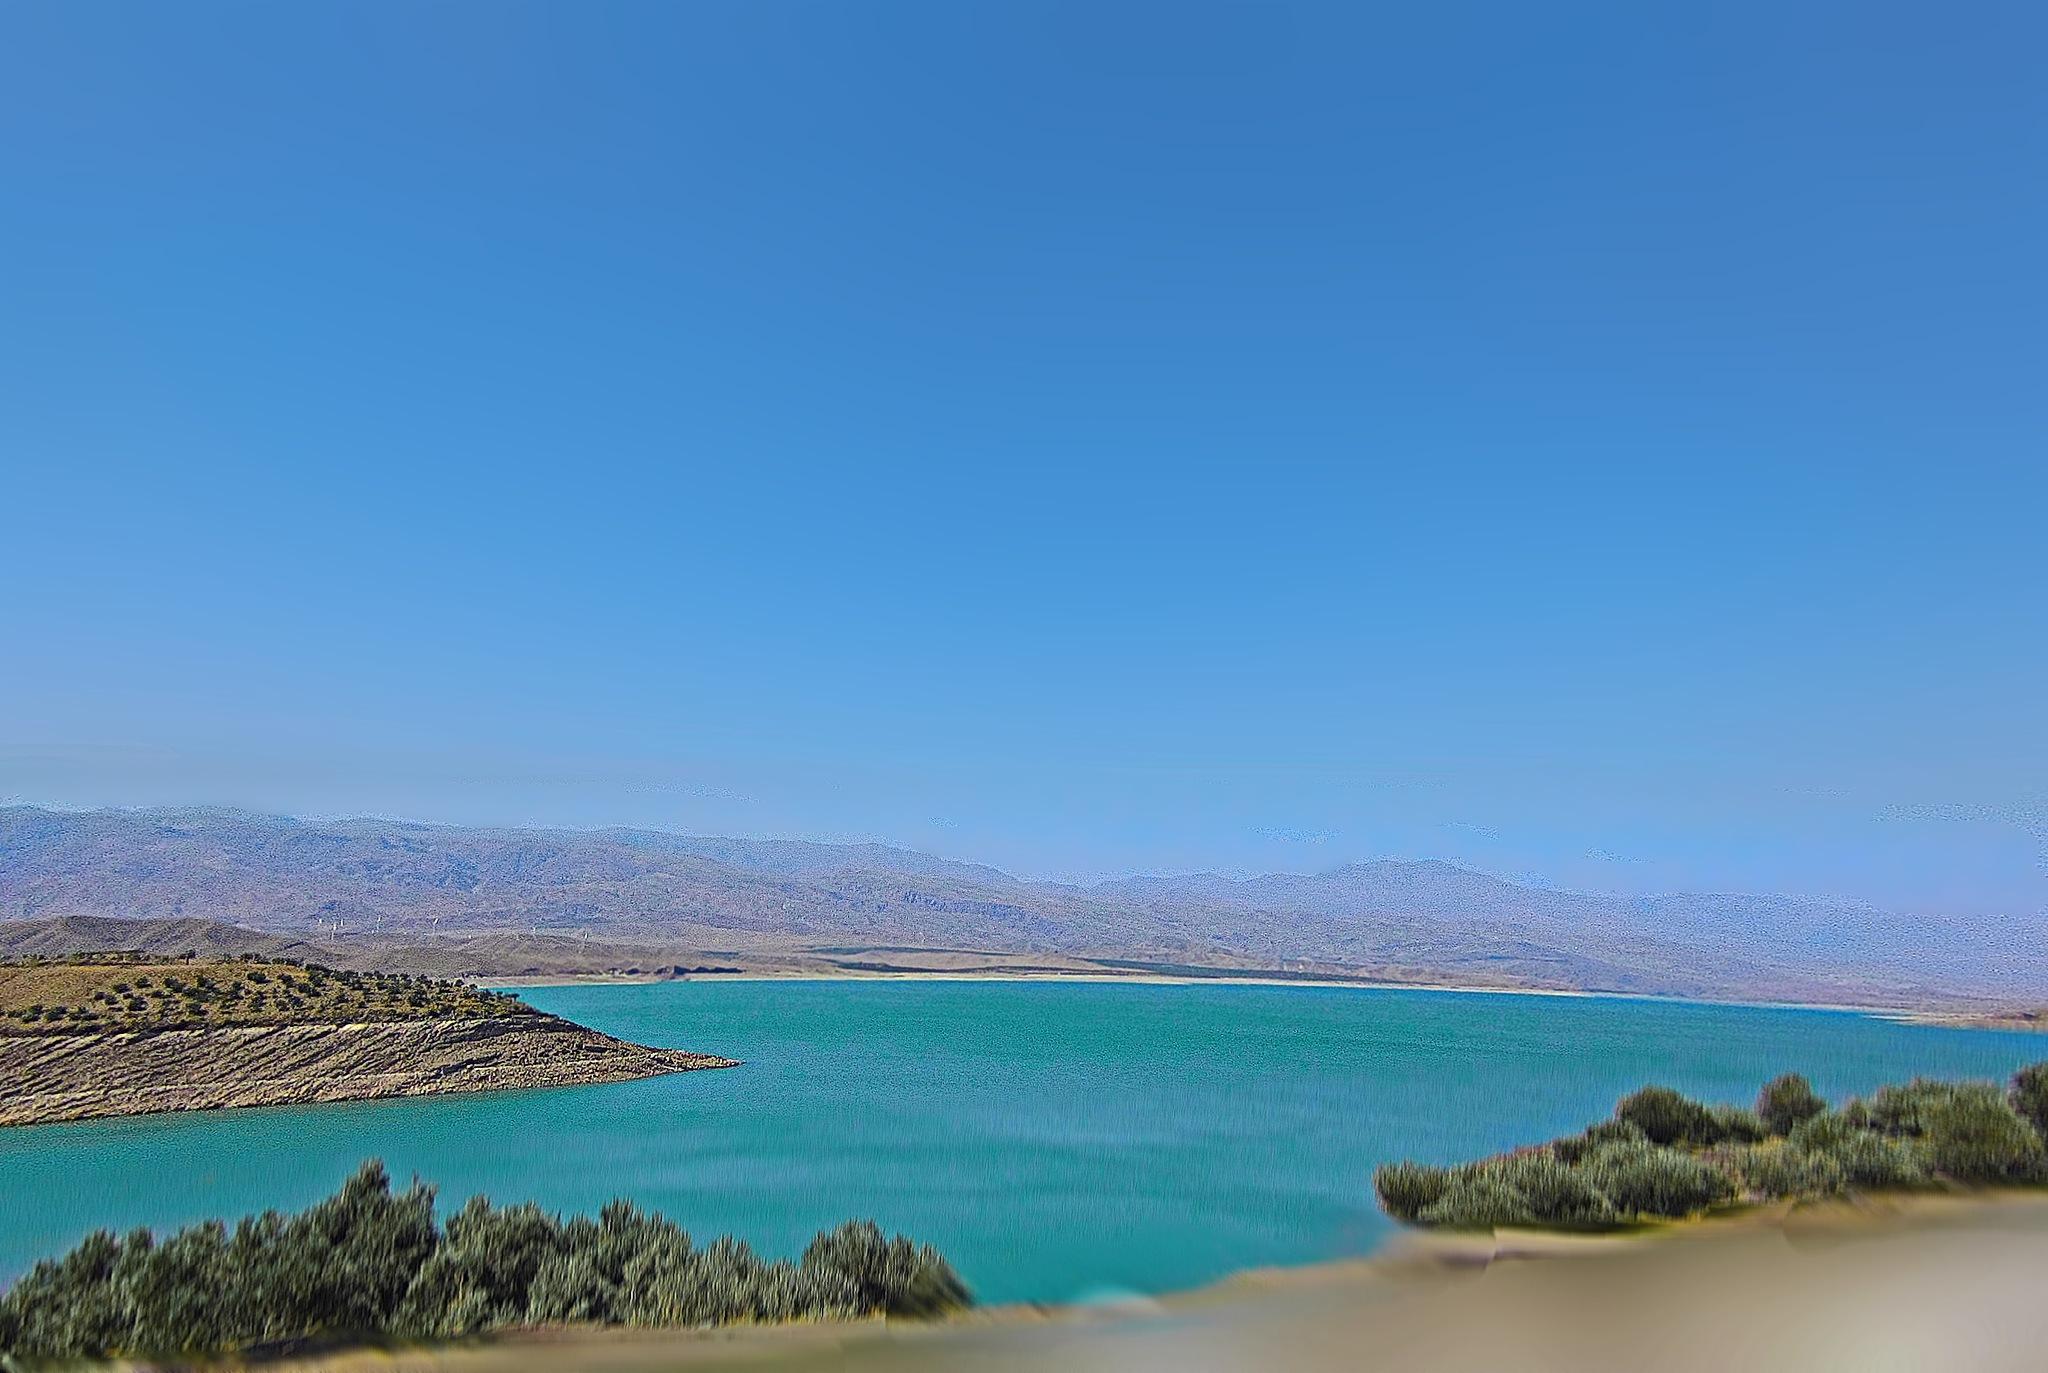 lake by kate1480